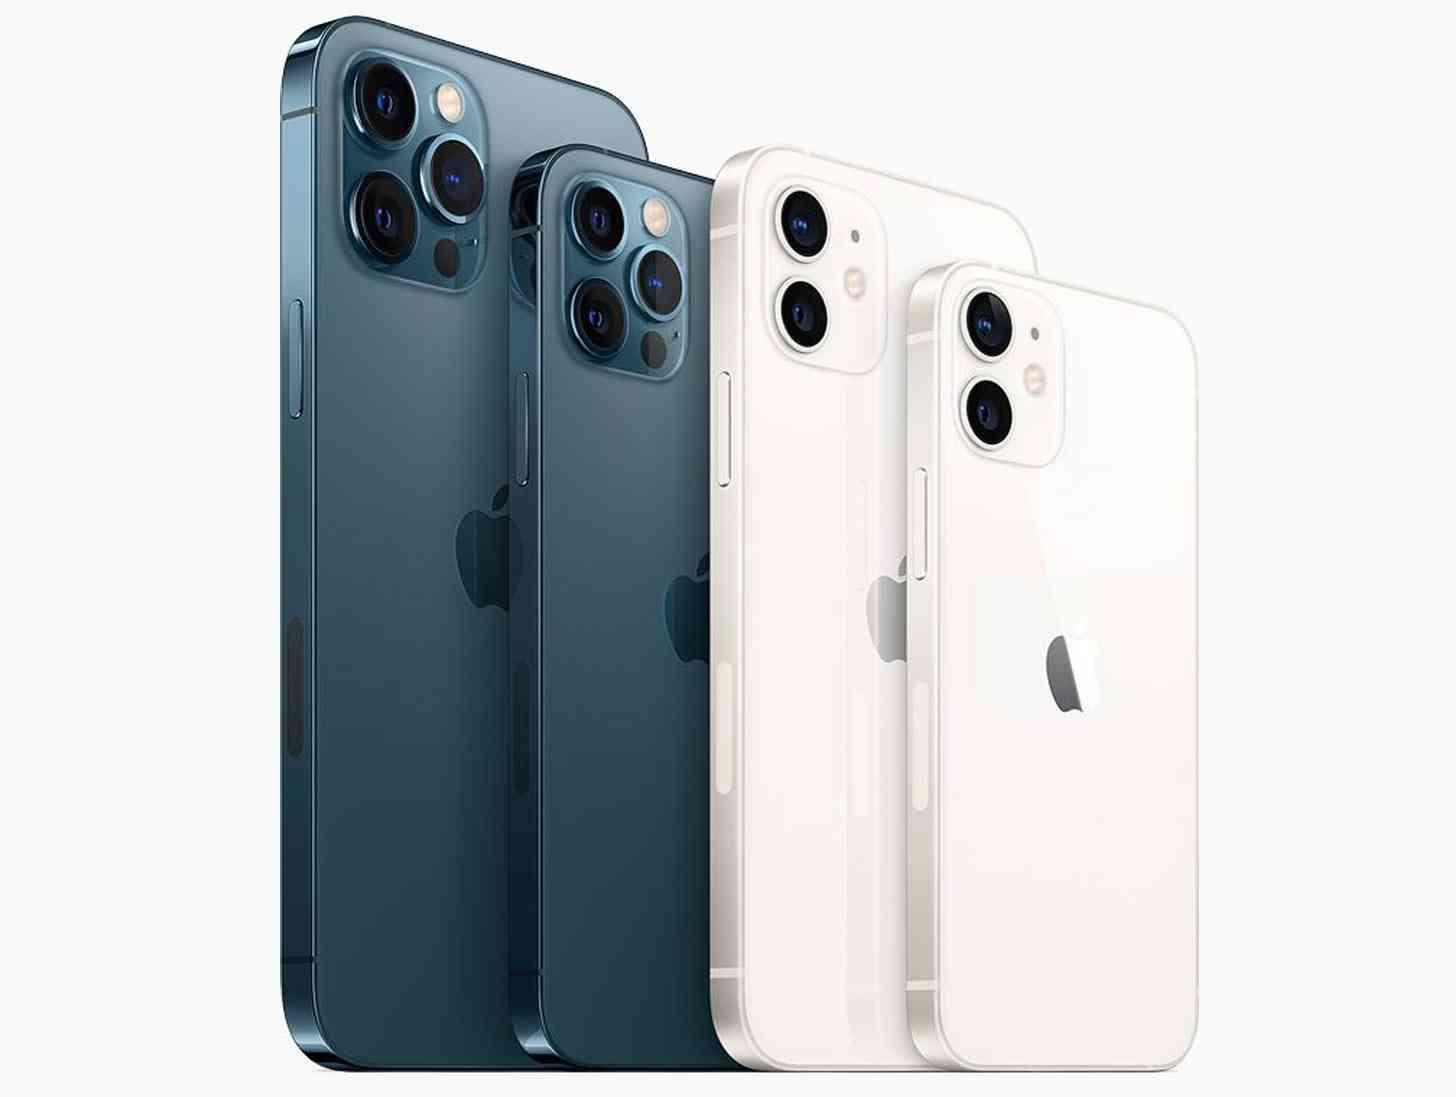 iPhone 12 models